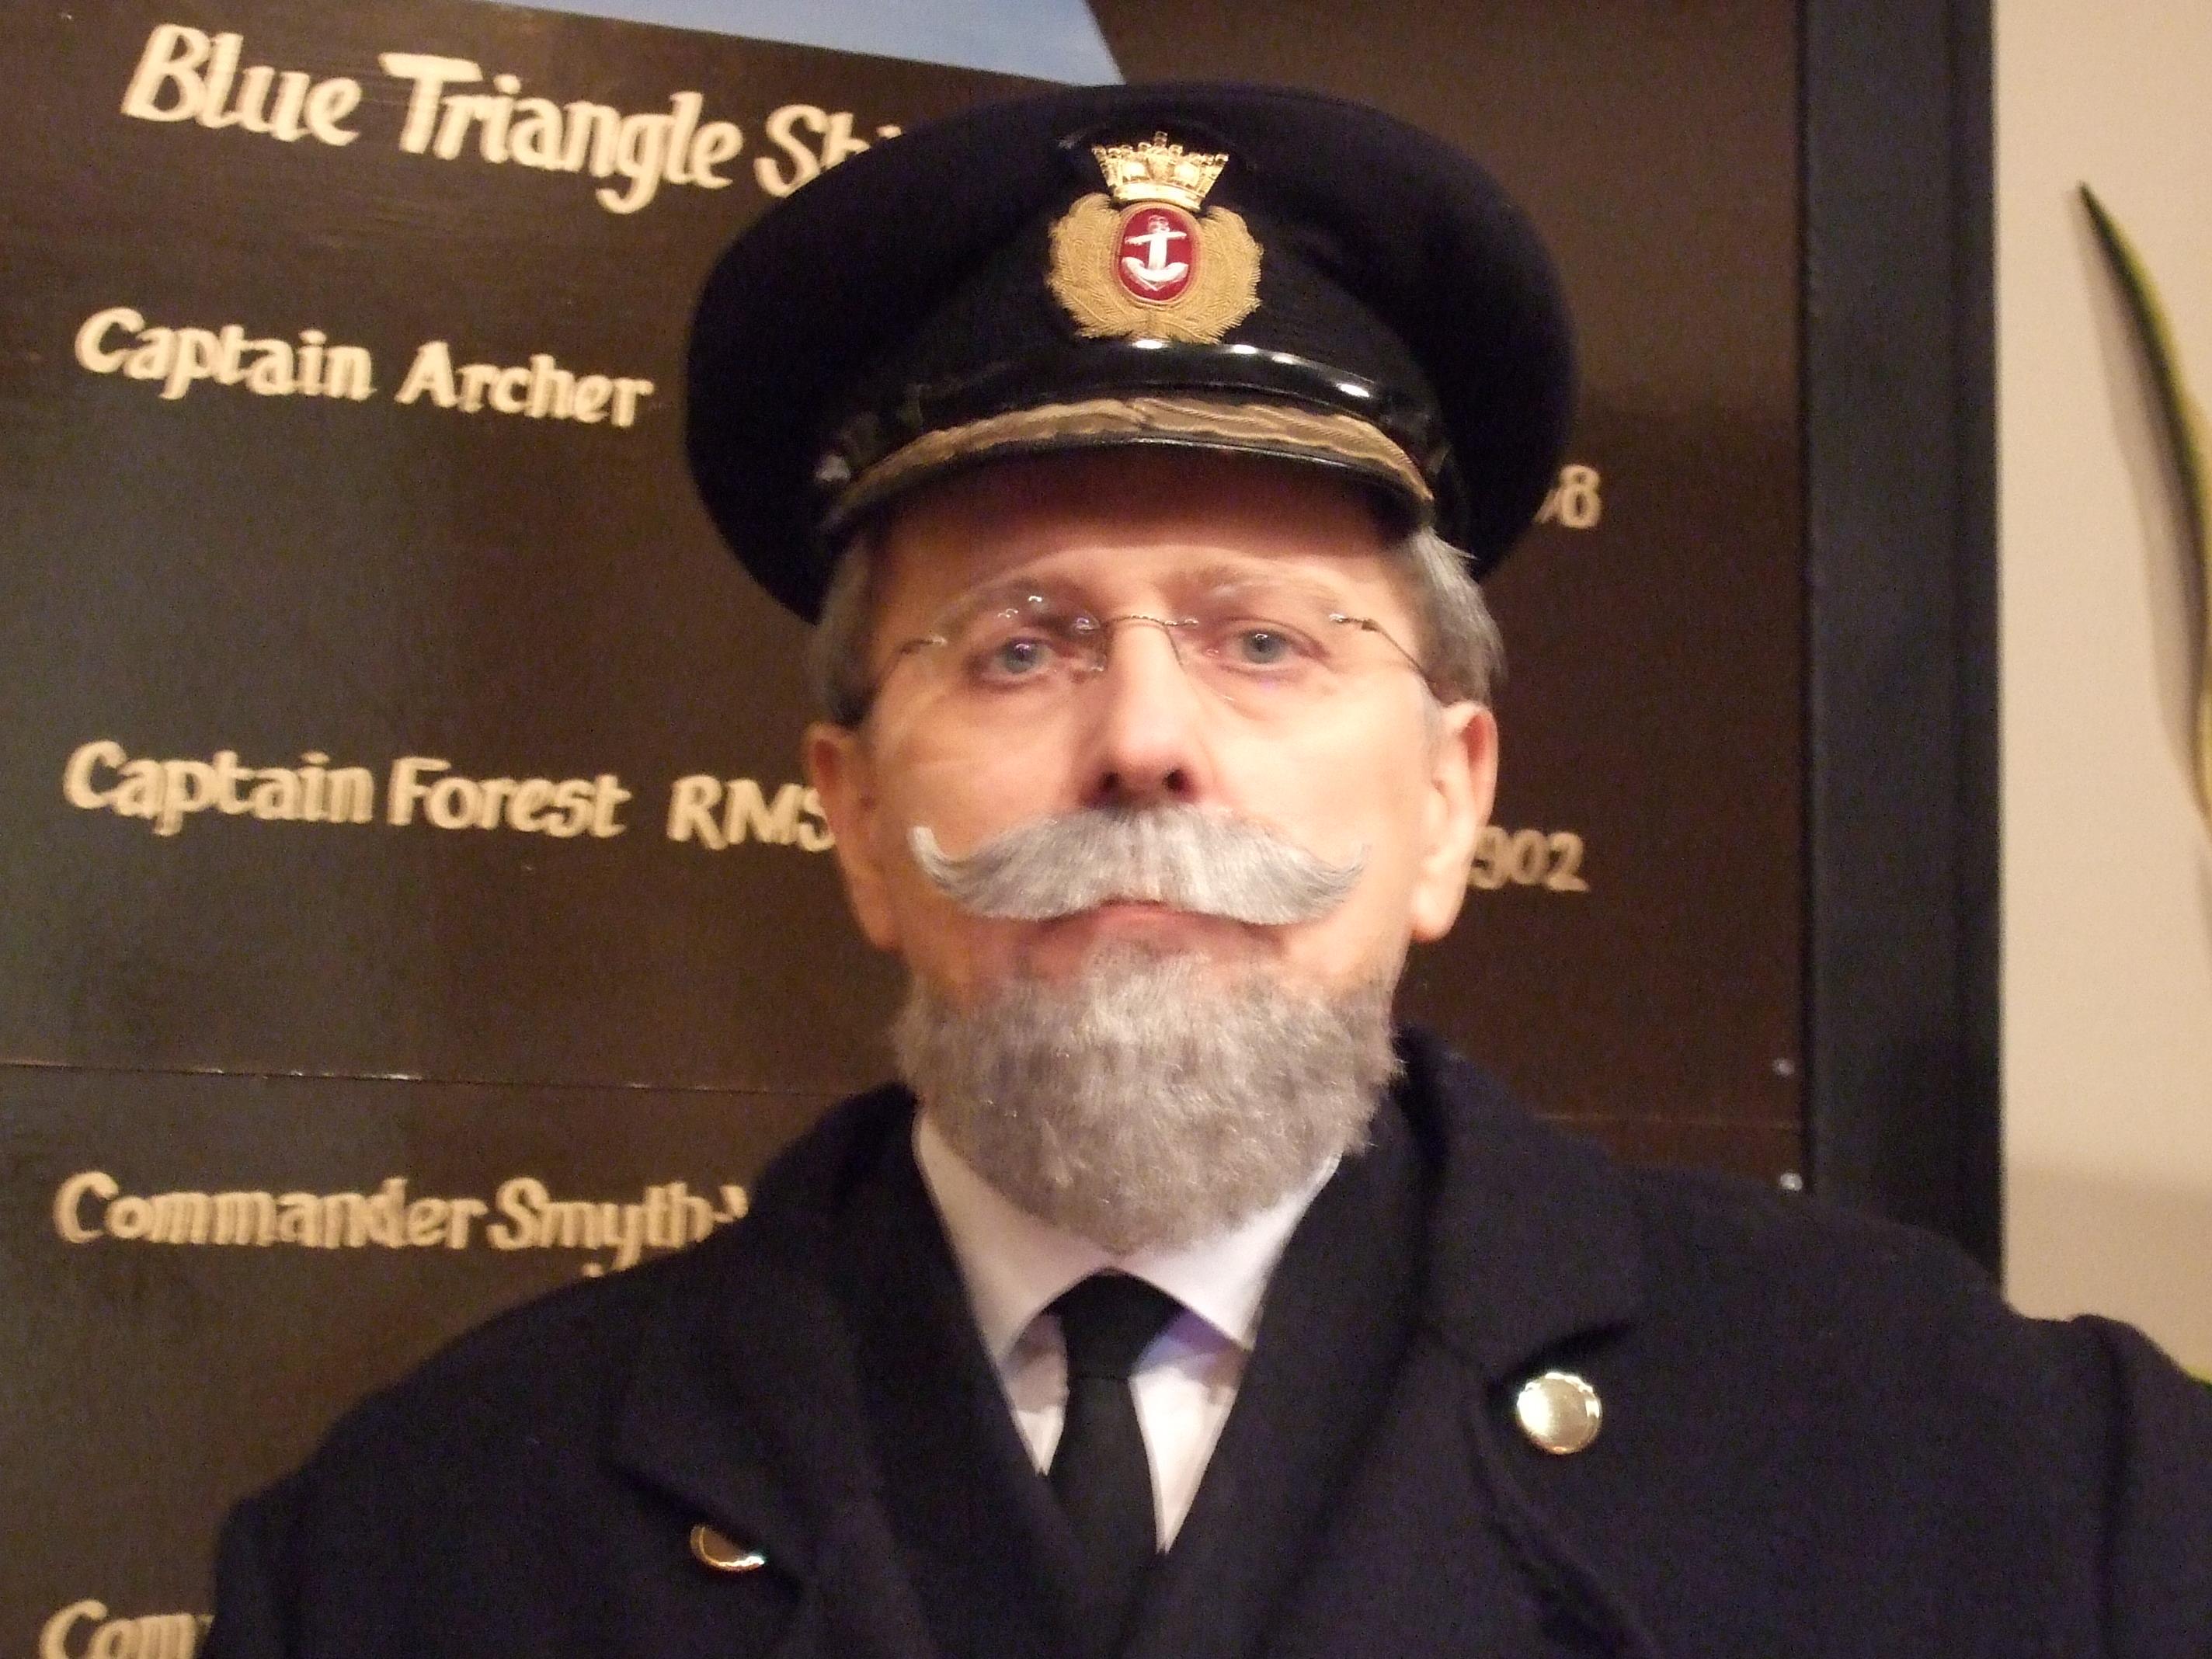 Captain Edward Pearson - 14.2.10